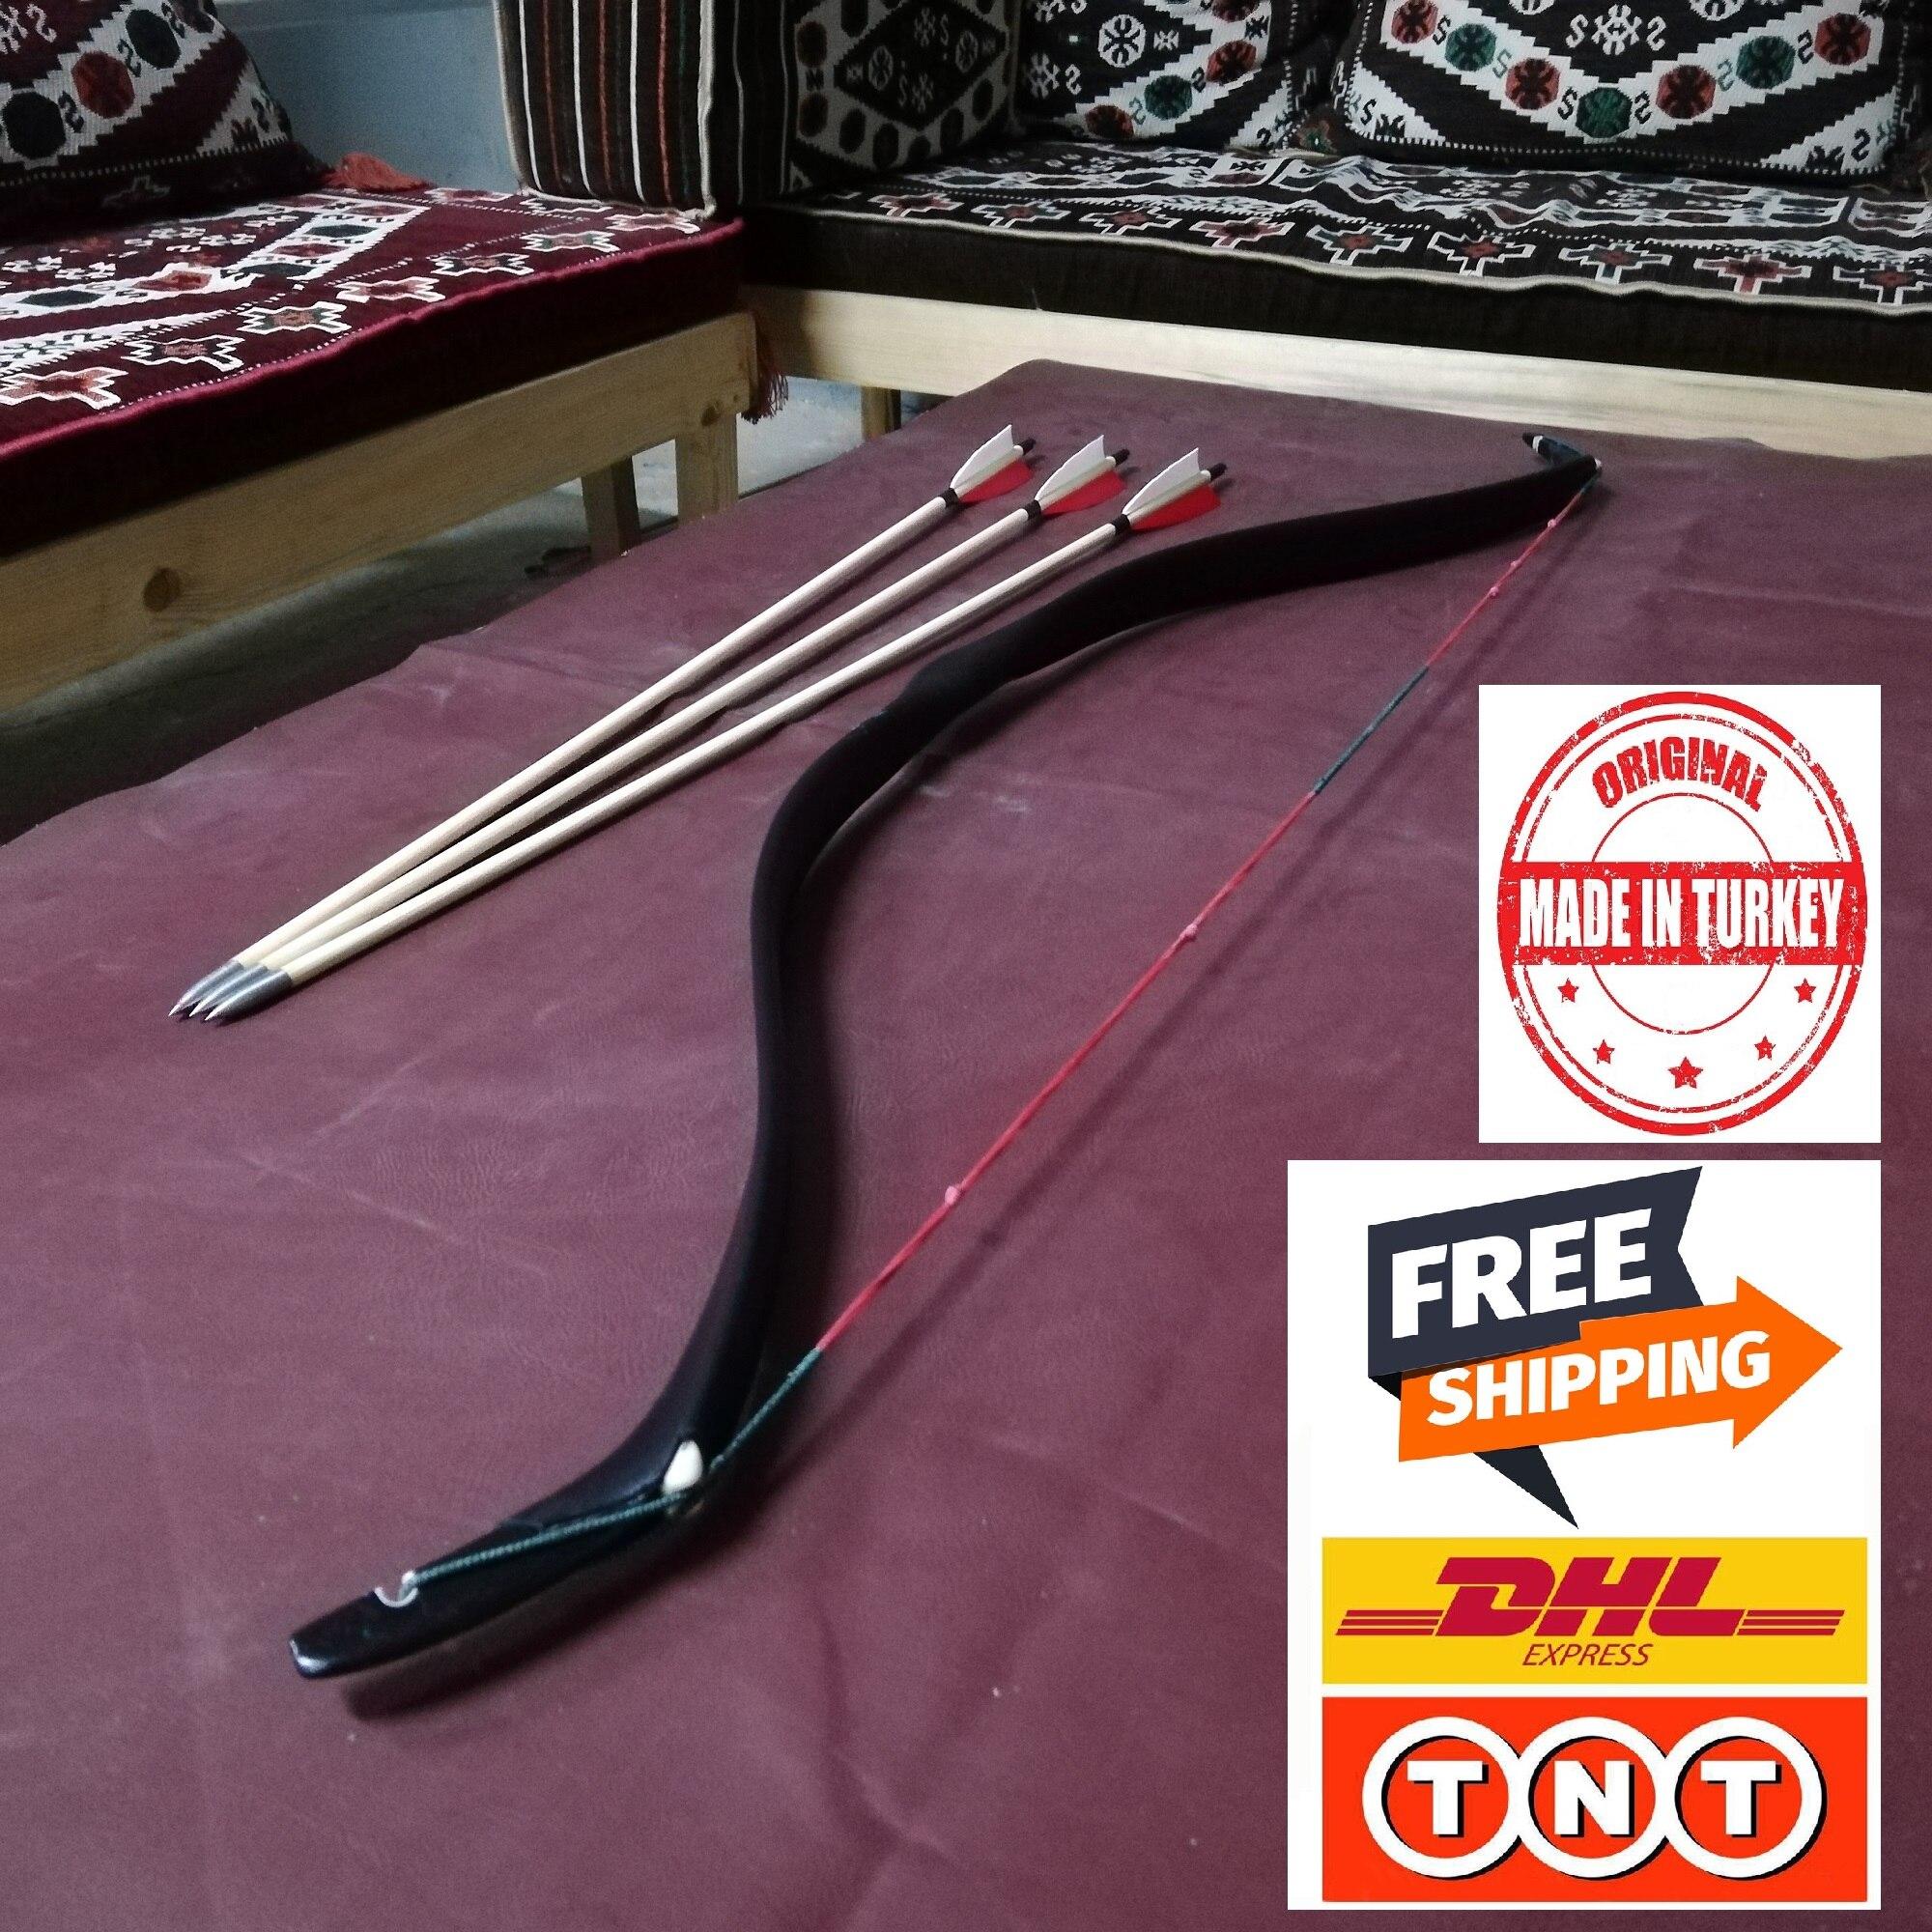 OKCUBABA PREMIUM TURKISH TRADITIONAL PV GLASS FIBER RESIN BOW TARGET SHOT 30-45 Lbs Turkish Ottoman Form-Free Shipping DHL / TNT